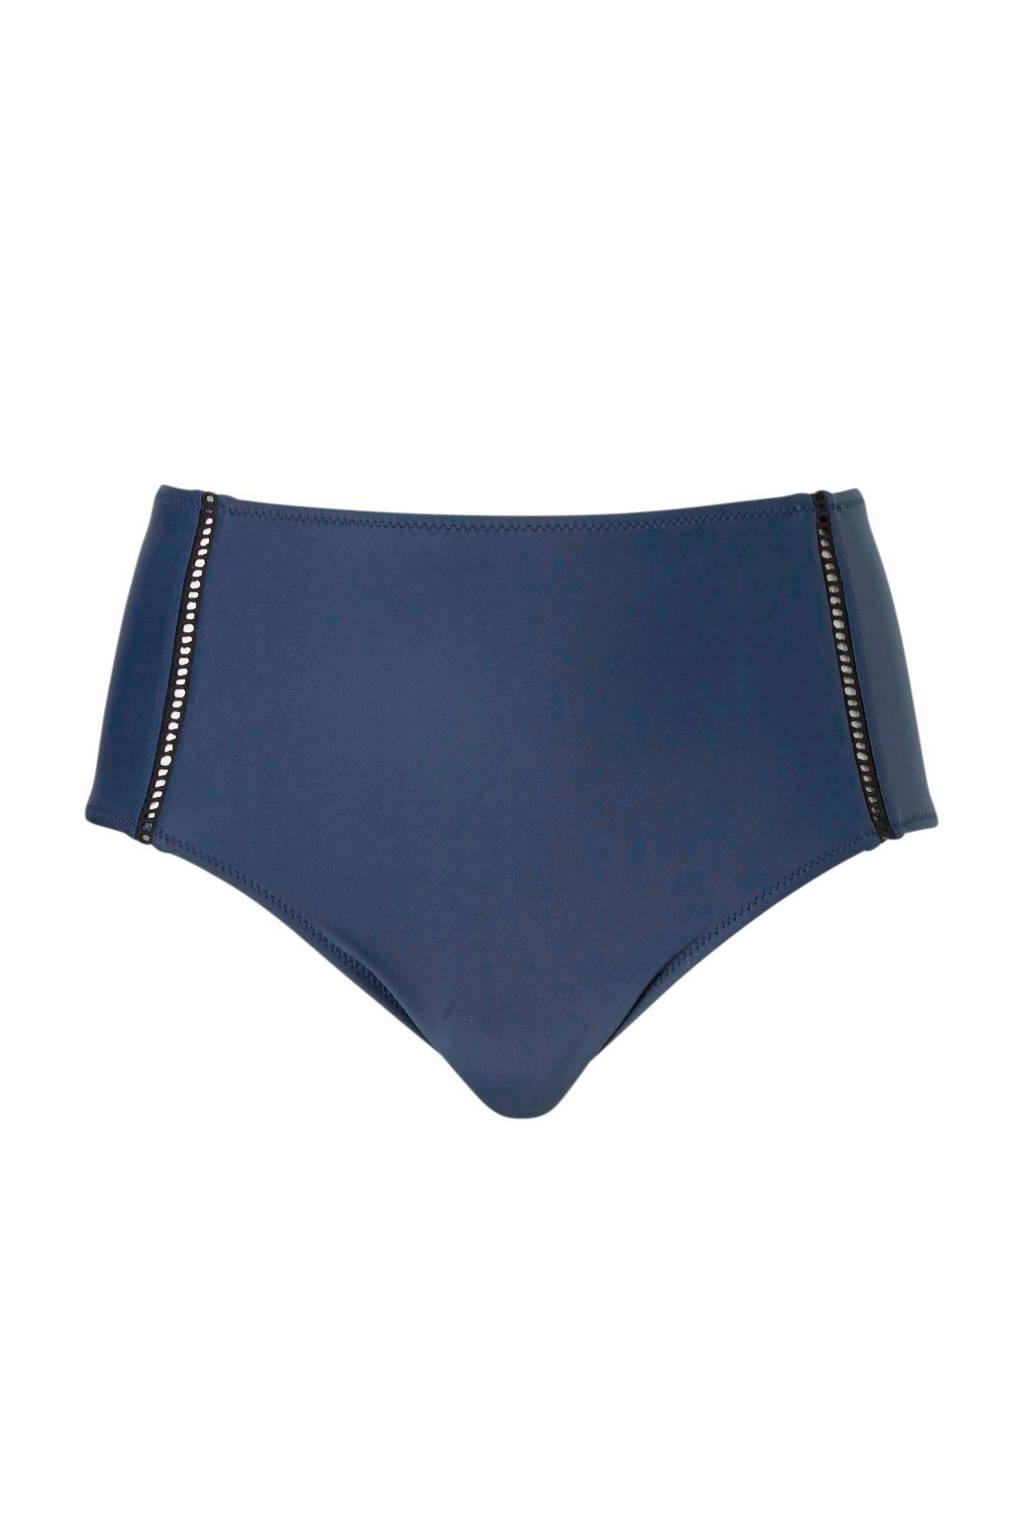 whkmp's beachwave Mix & Match corrigerend broekje high waist blauw, Blauw/zwart